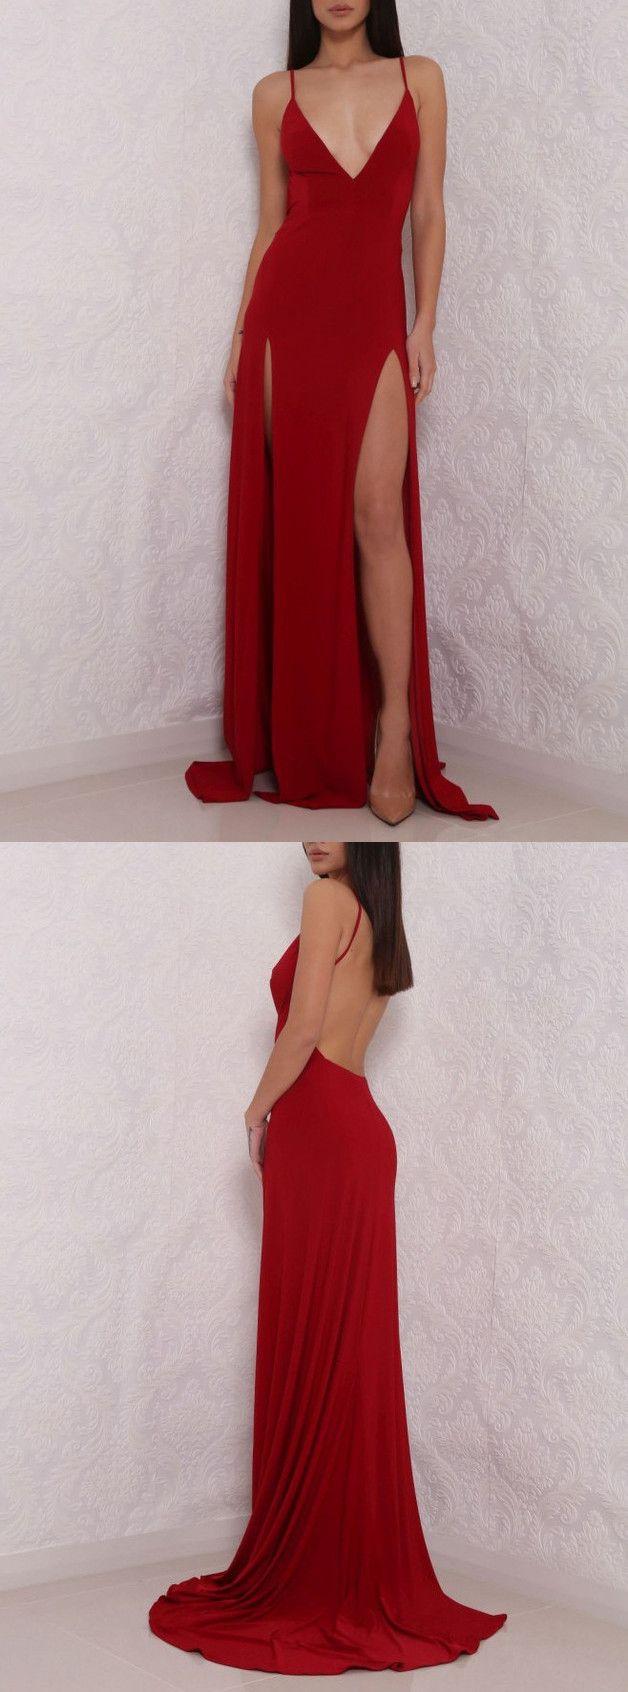 46 best Dresses images on Pinterest | Dress prom, Dress skirt and ...